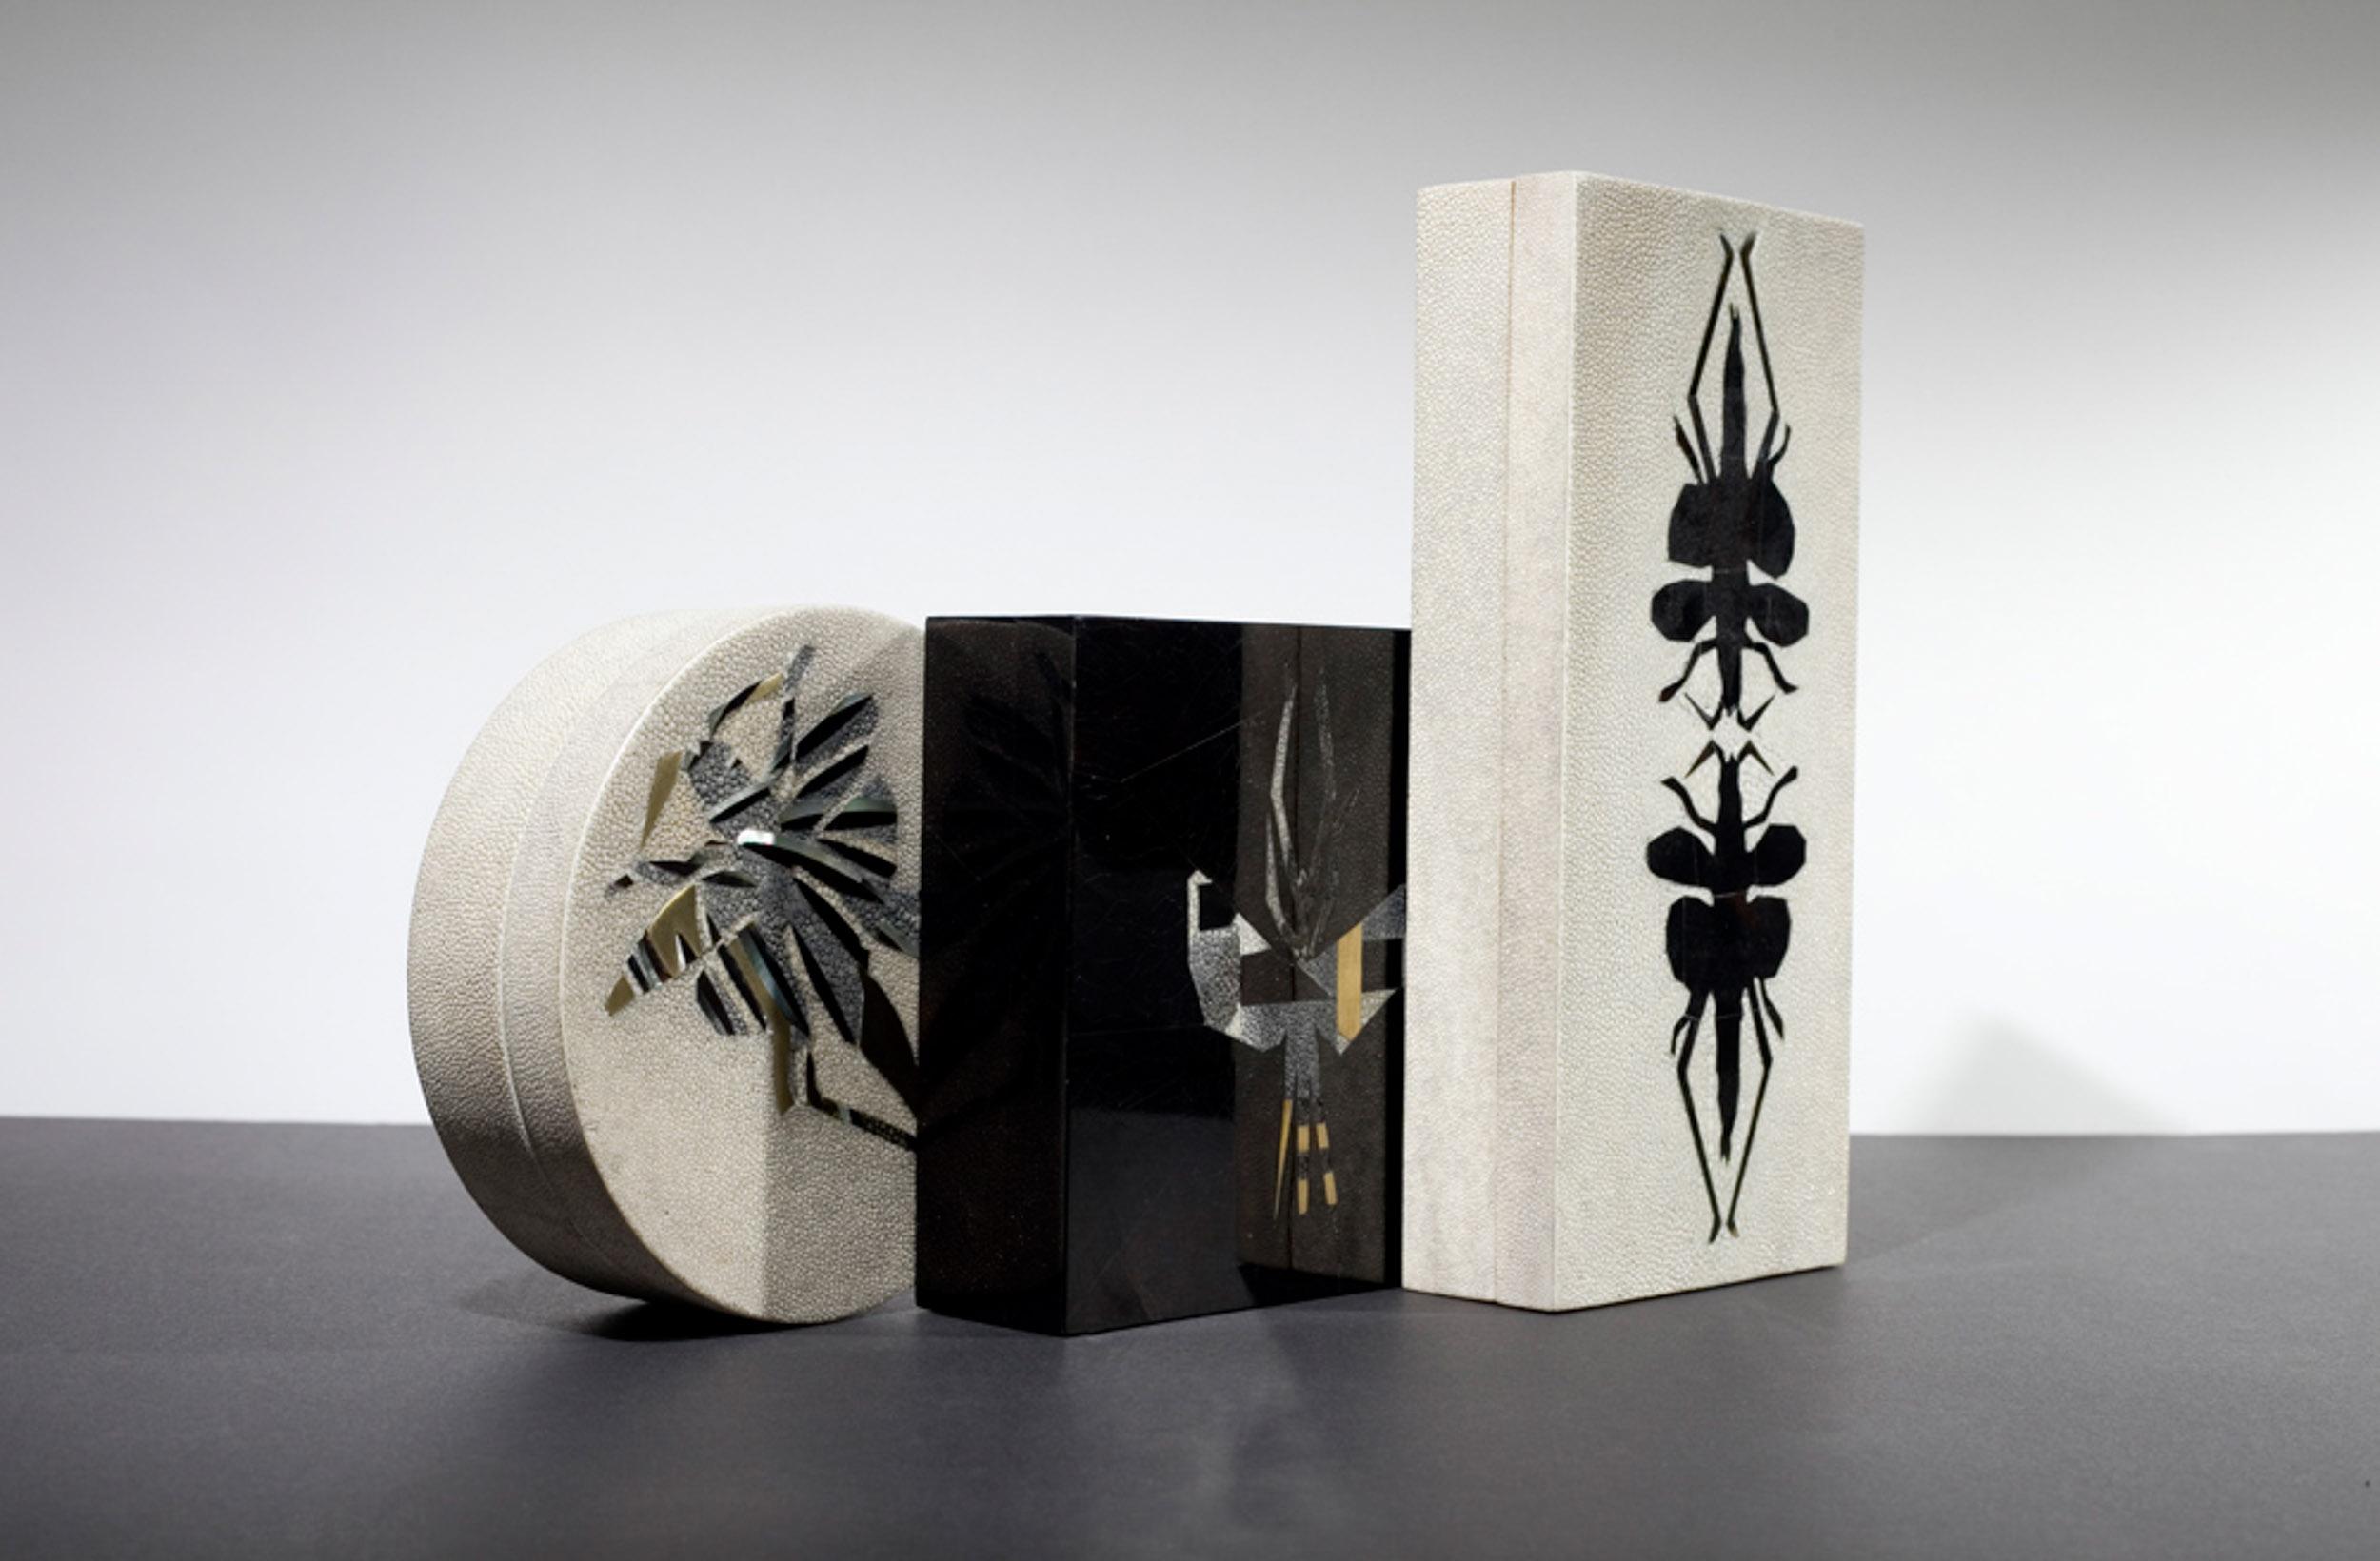 kifu-paris-patterns-textures-bugs-emblems